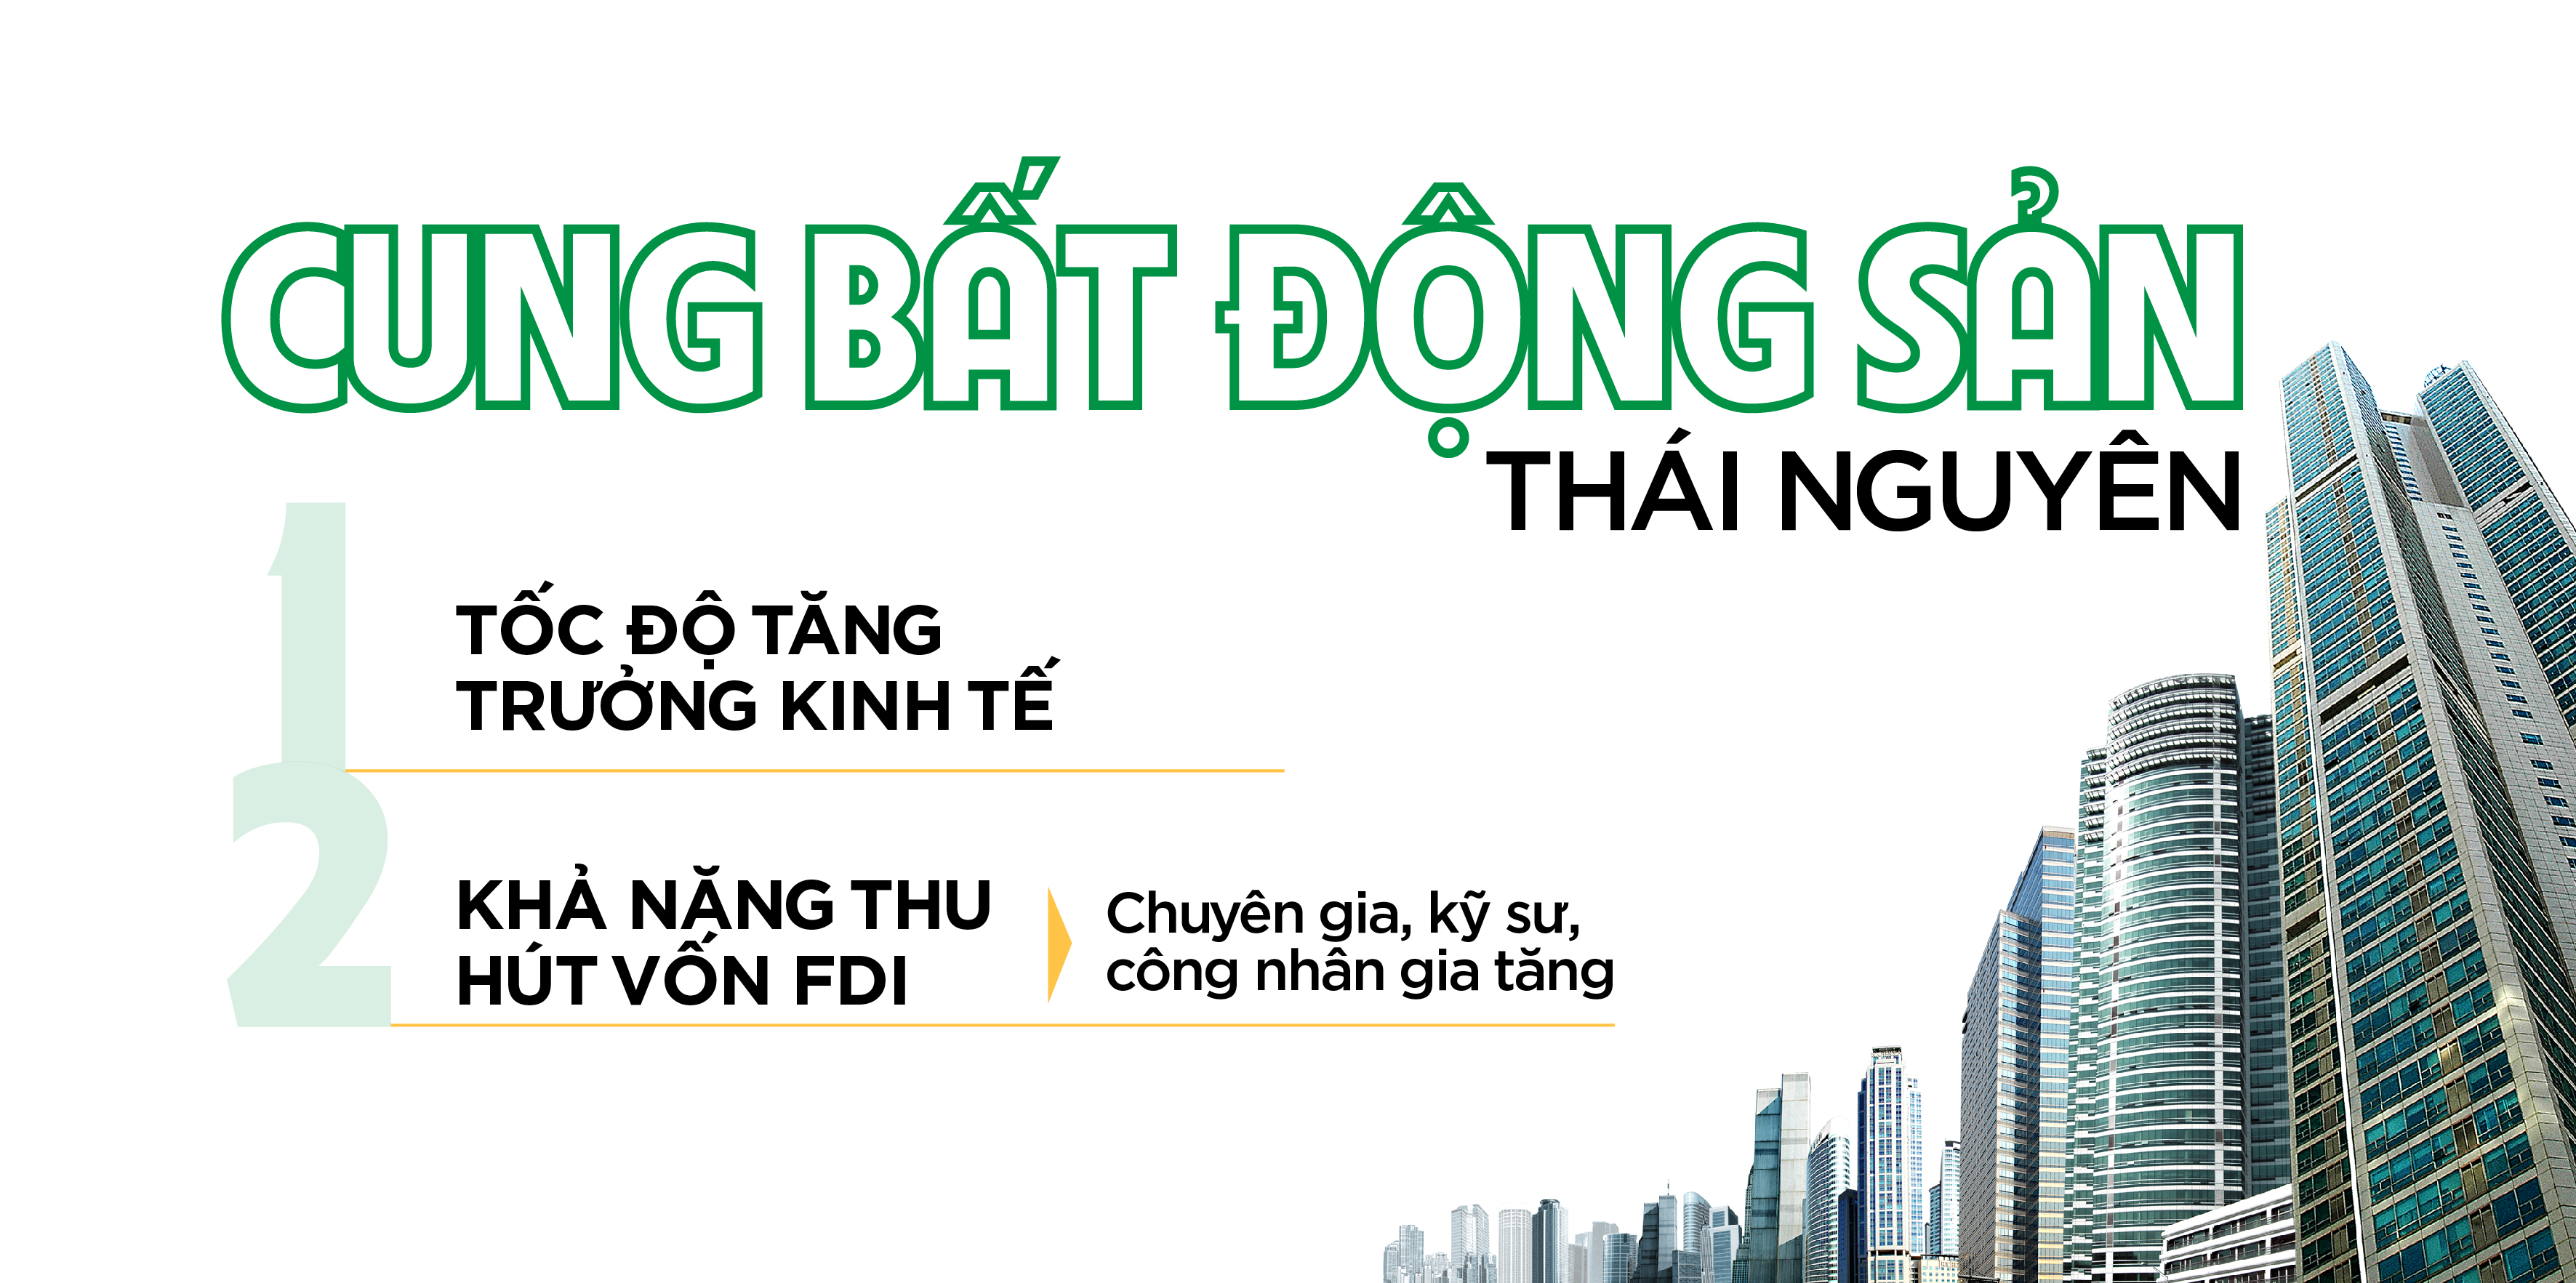 bat-dong-san-thai-nguyen-info-5